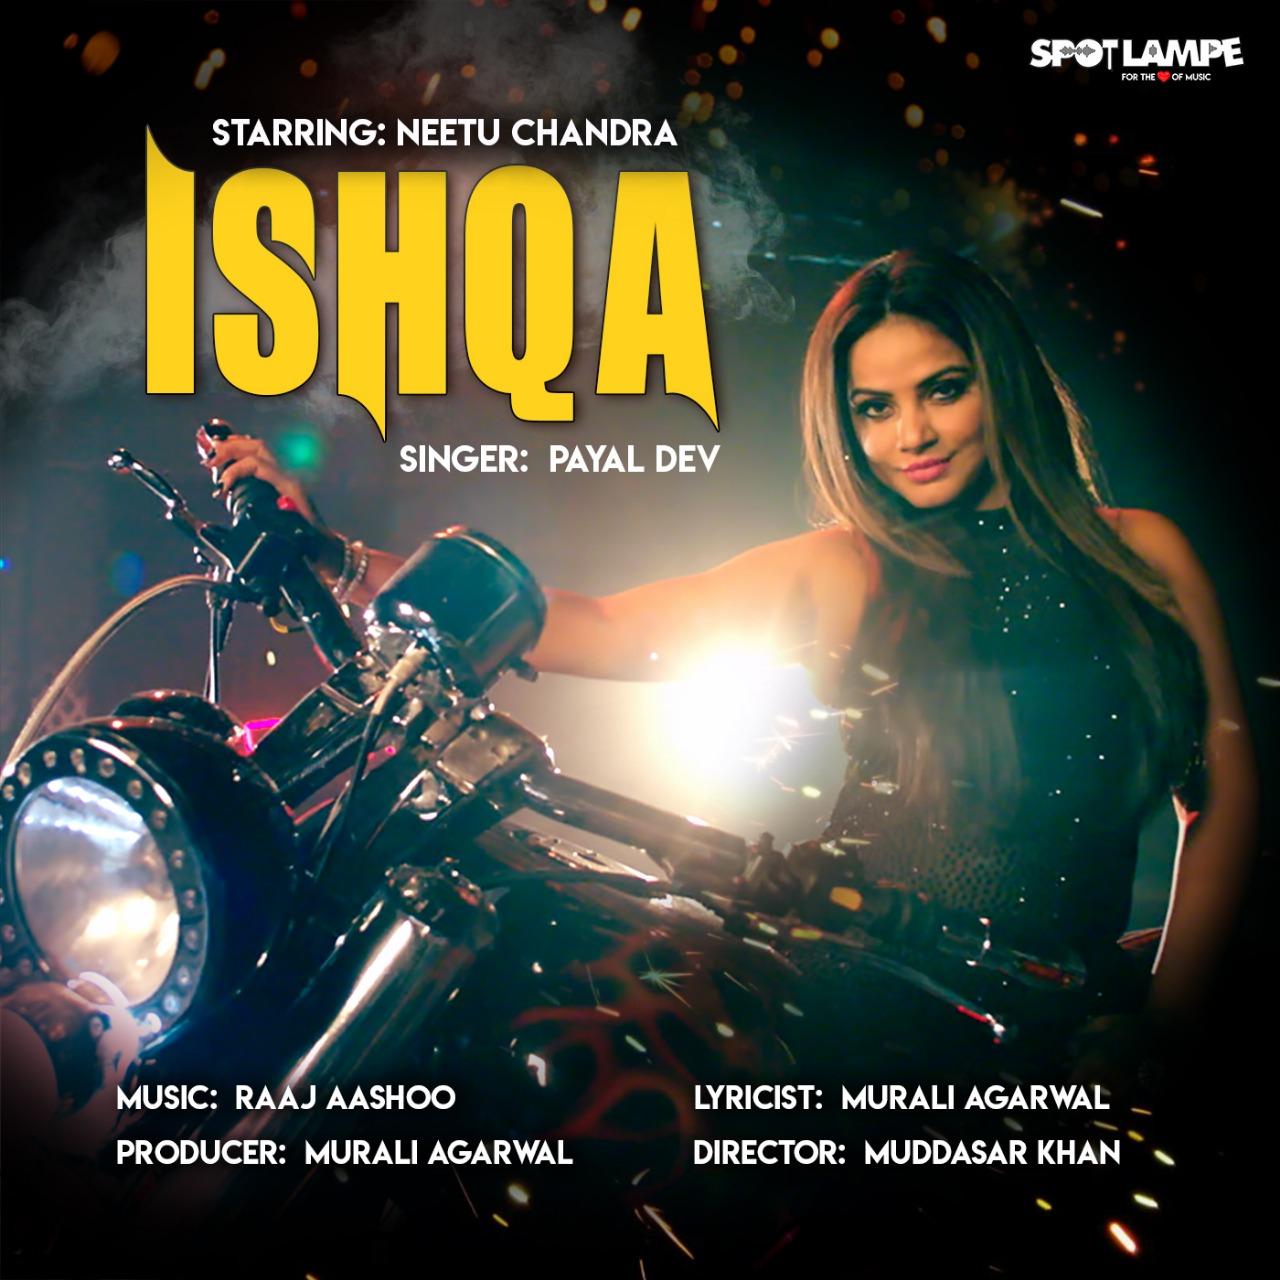 Spotlampe.Com Announces The Launch Of Ishqa Featuring Neetu Chandra